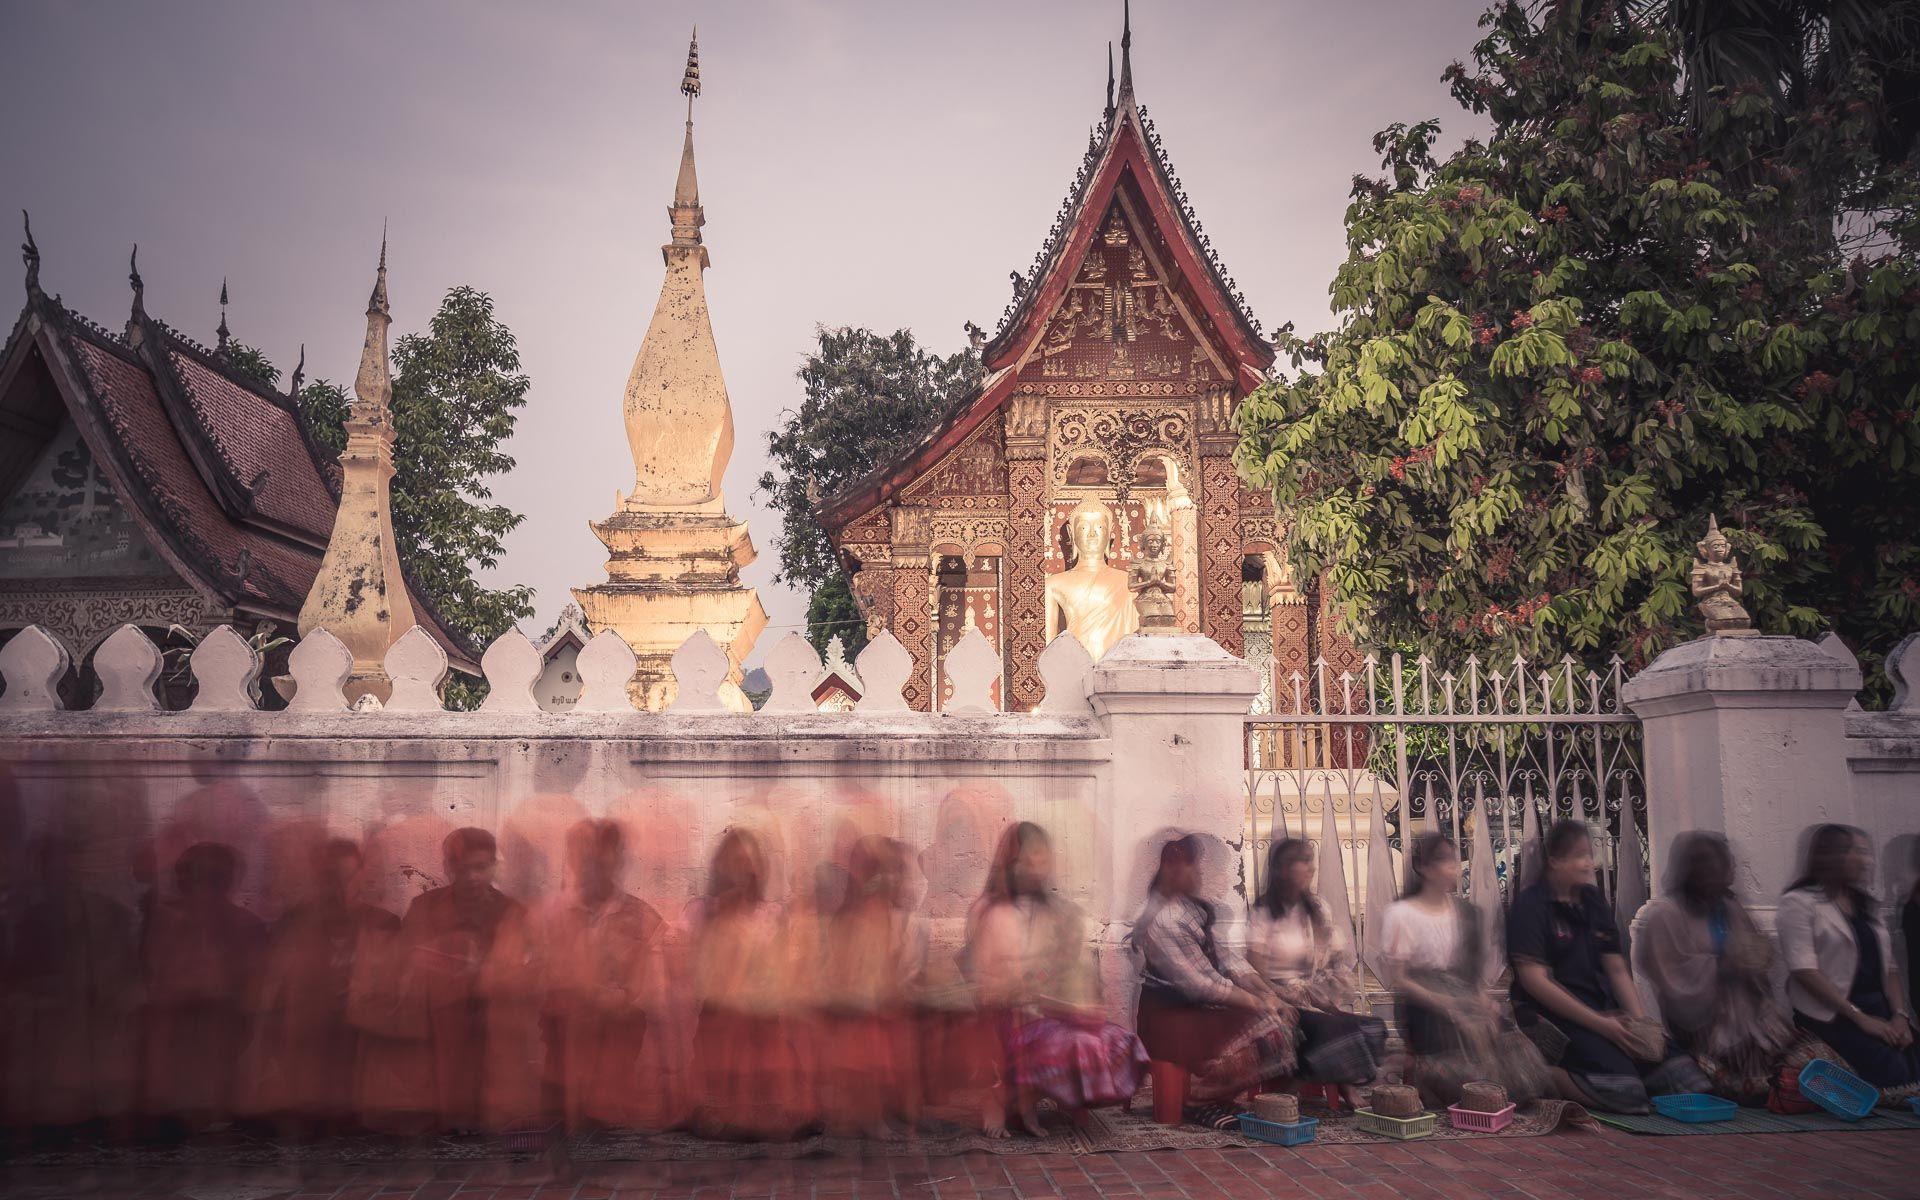 Lesvoyageuses-voyage-laos-luang-prabang-ceremonie-offrandes-4